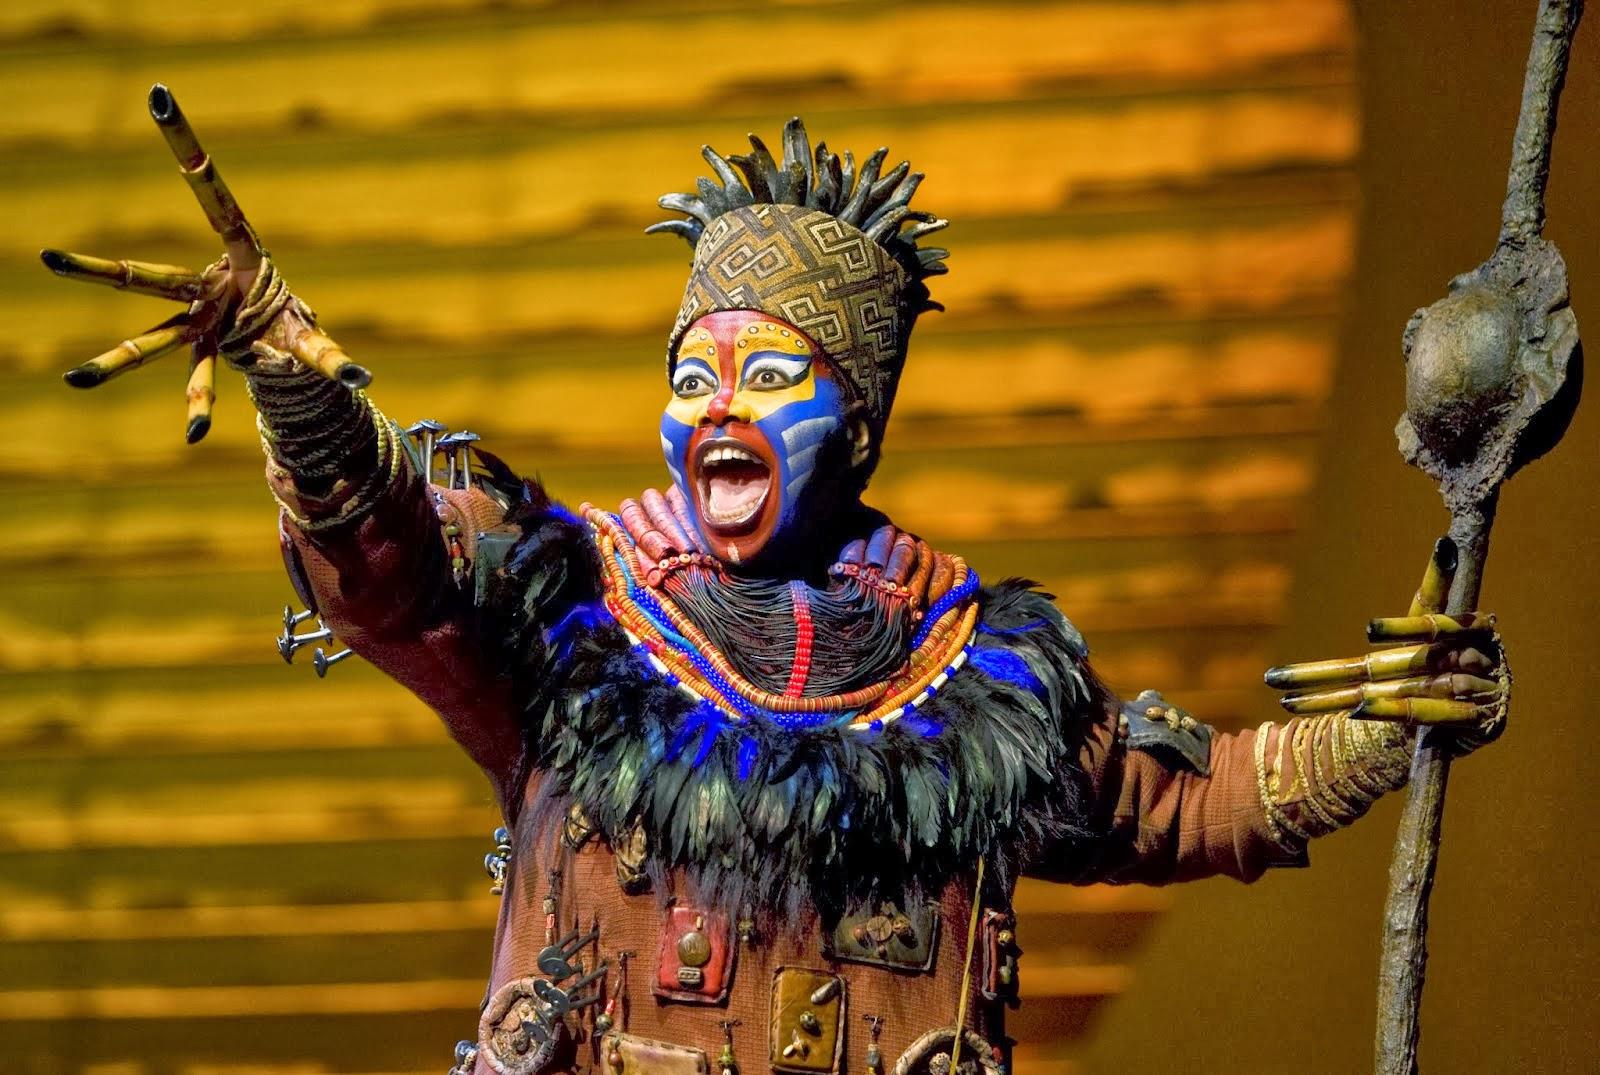 Lion King Rafiki Broadway Broadway 39 s The Lion King